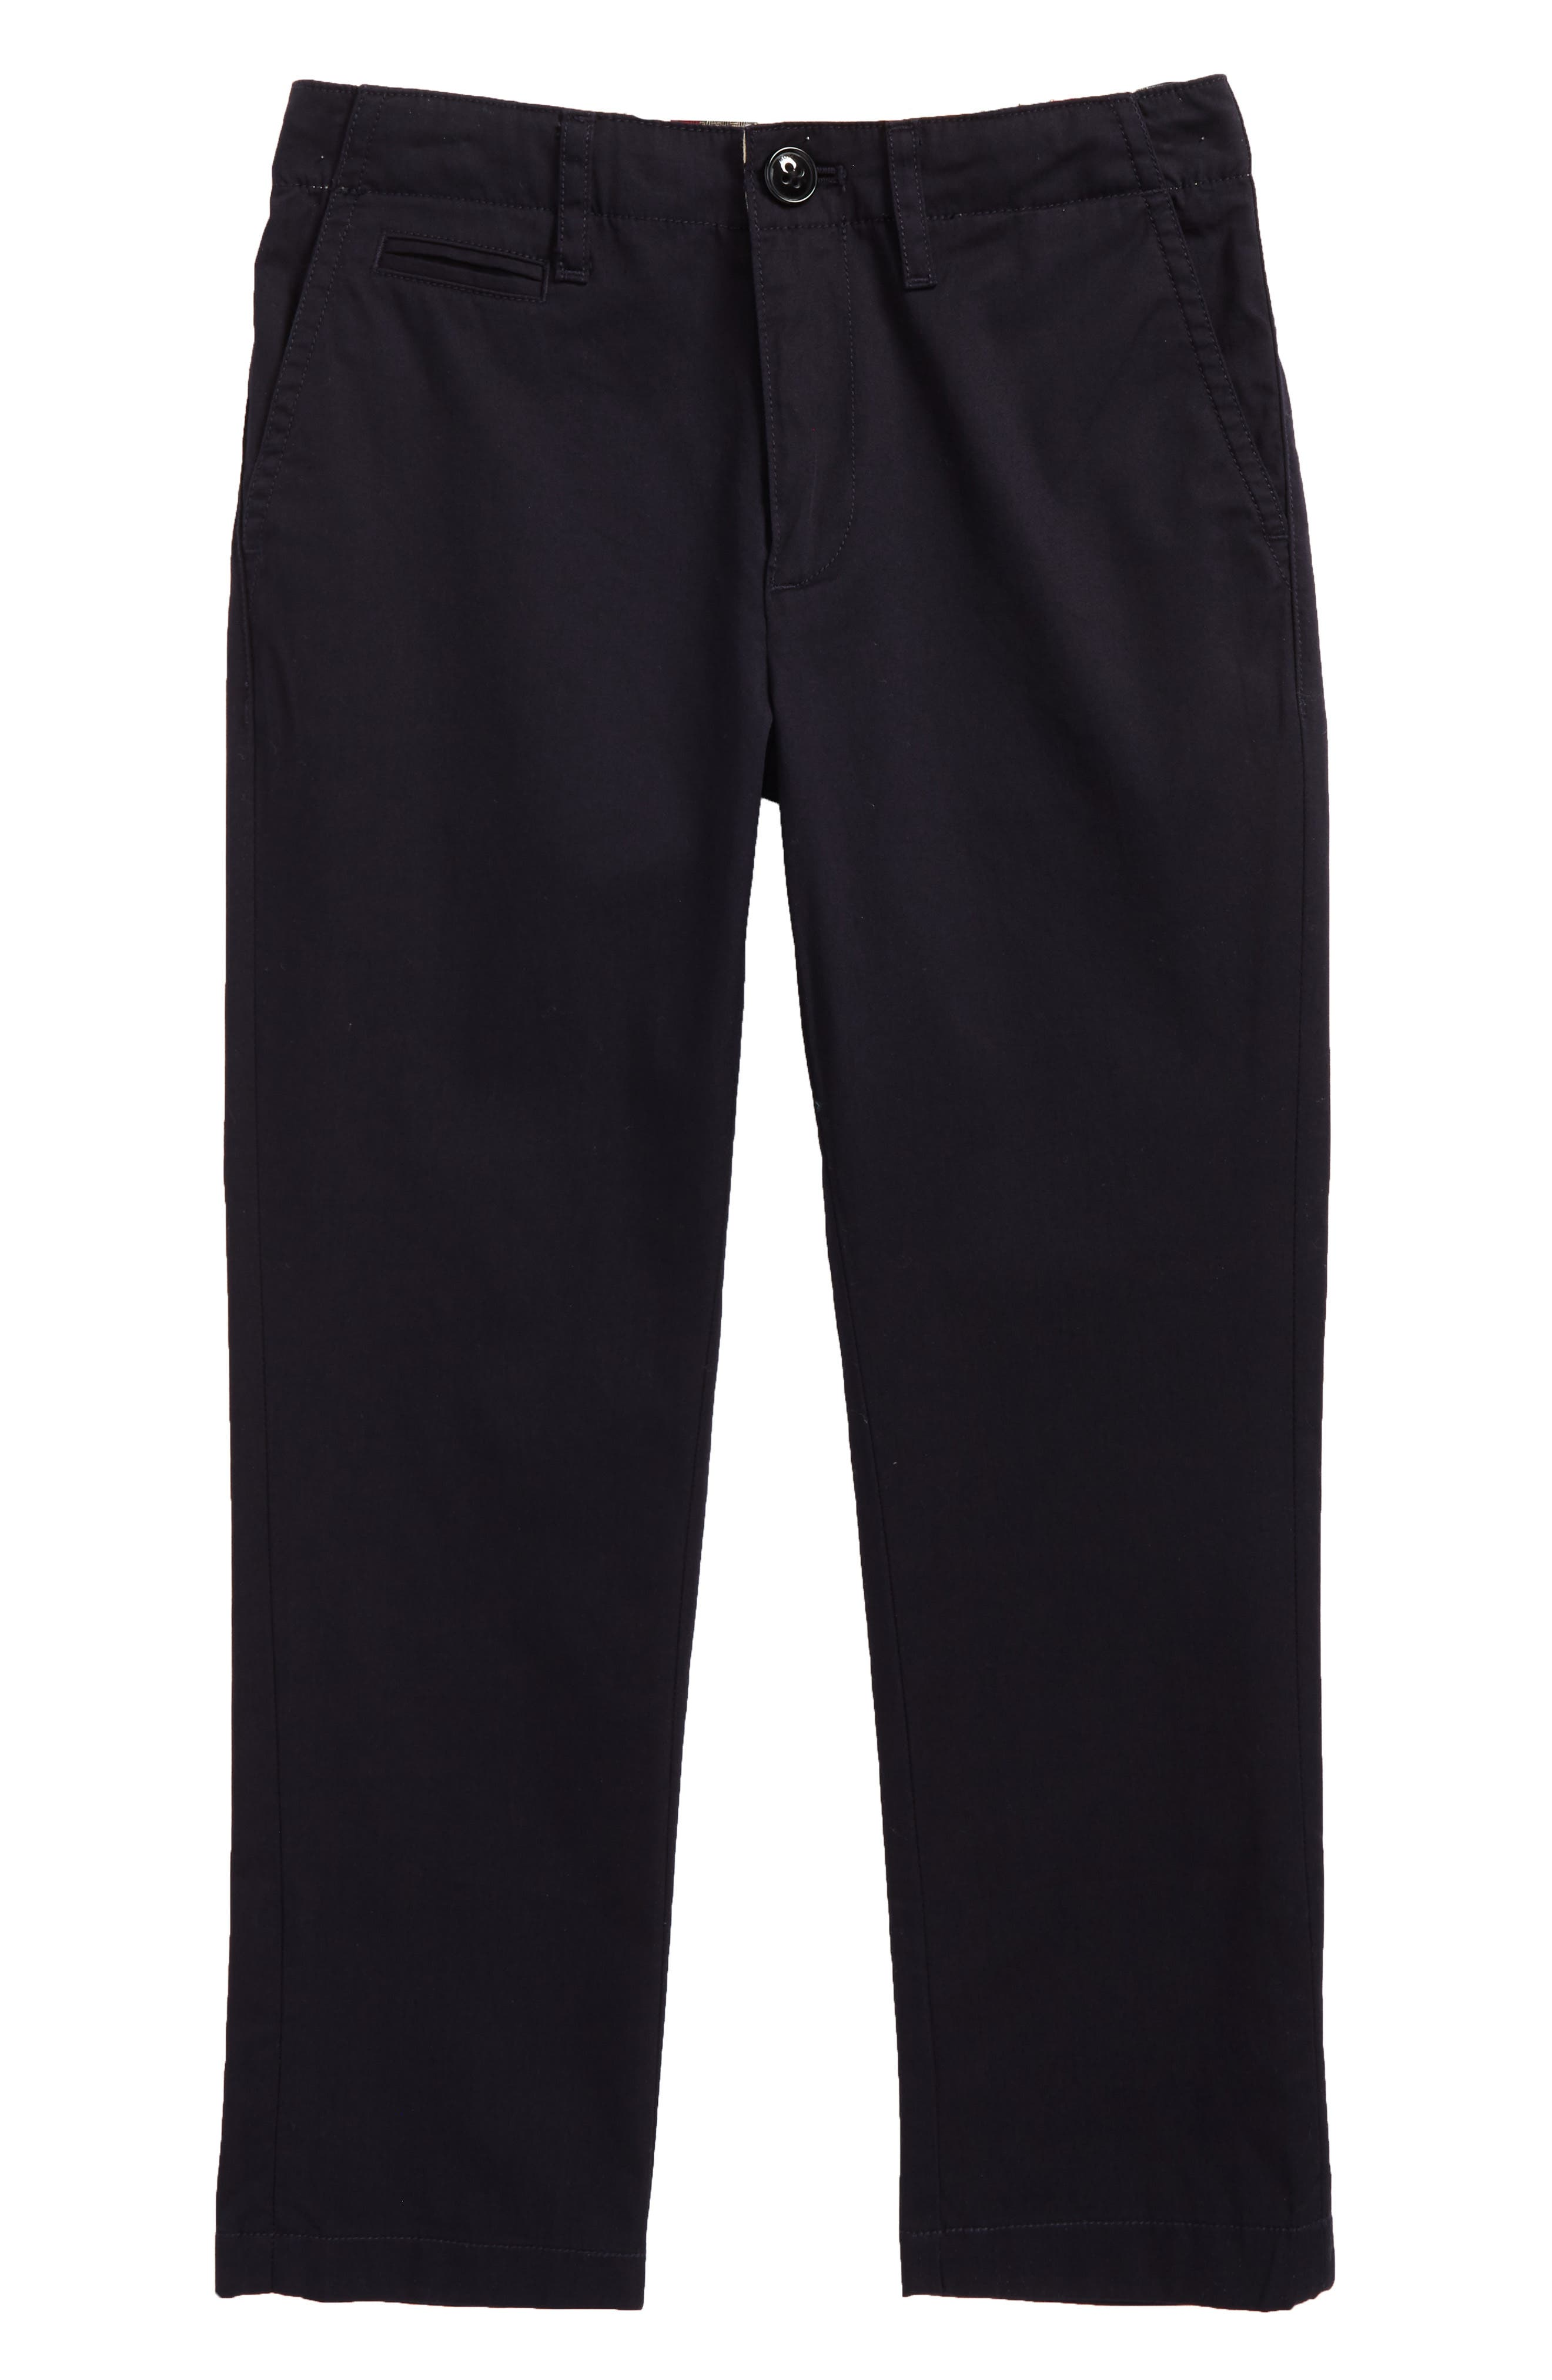 Alternate Image 1 Selected - Burberry Teo Straight Leg Pants (Little Boys & Big Boys)